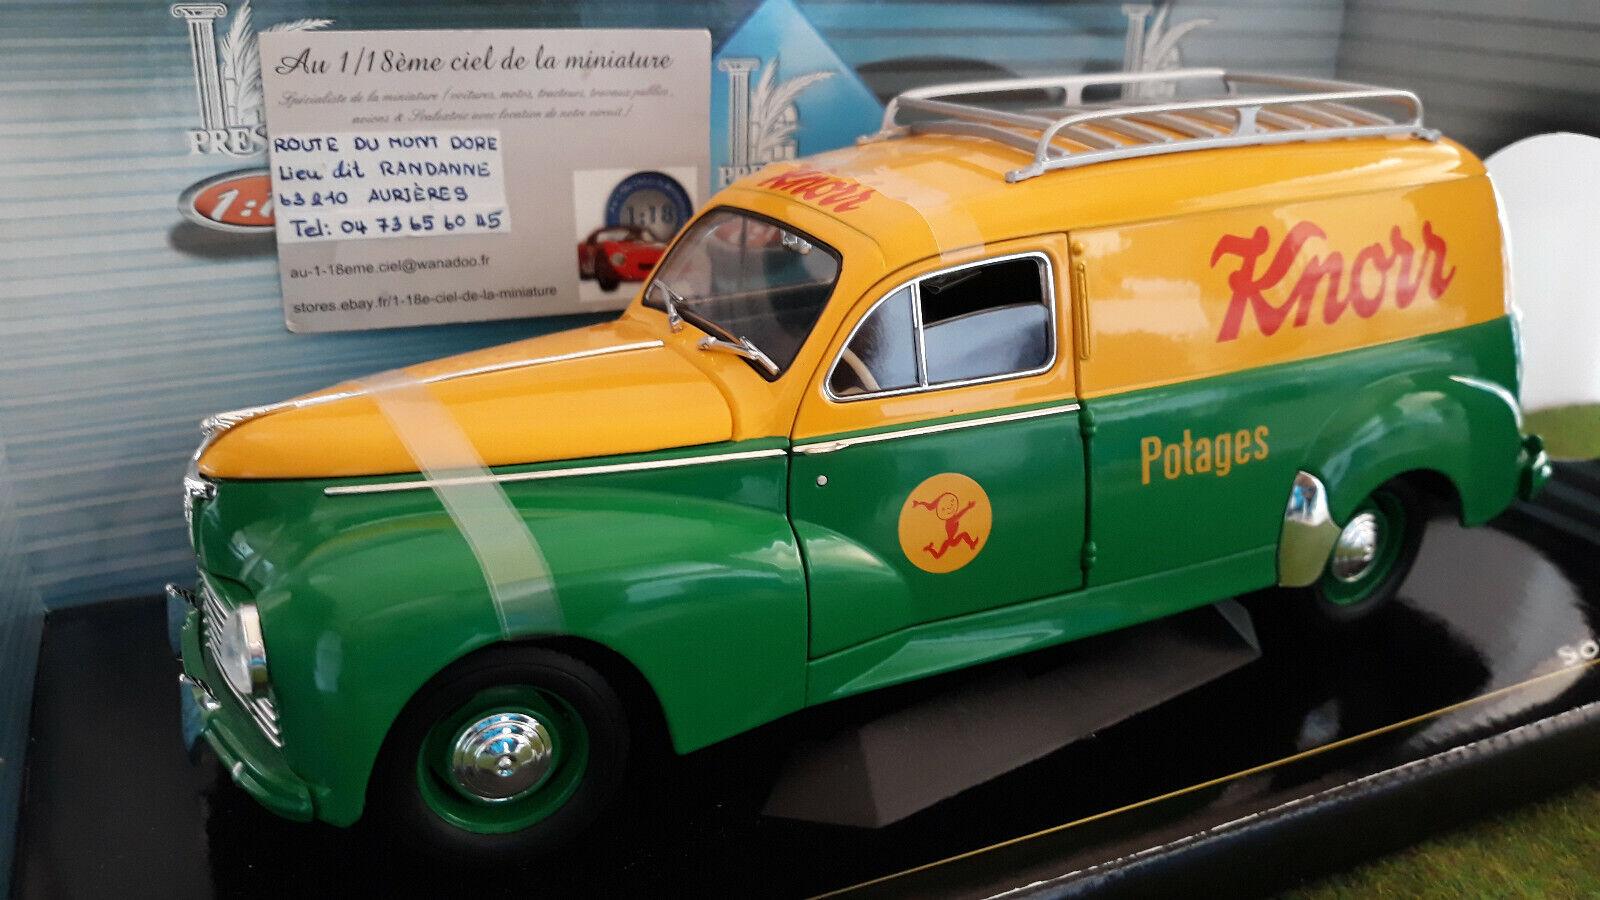 PEUGEOT 203 BREAK TOLE KNORR Potages 1 18 SOLIDO 8426 voiture miniature collecti